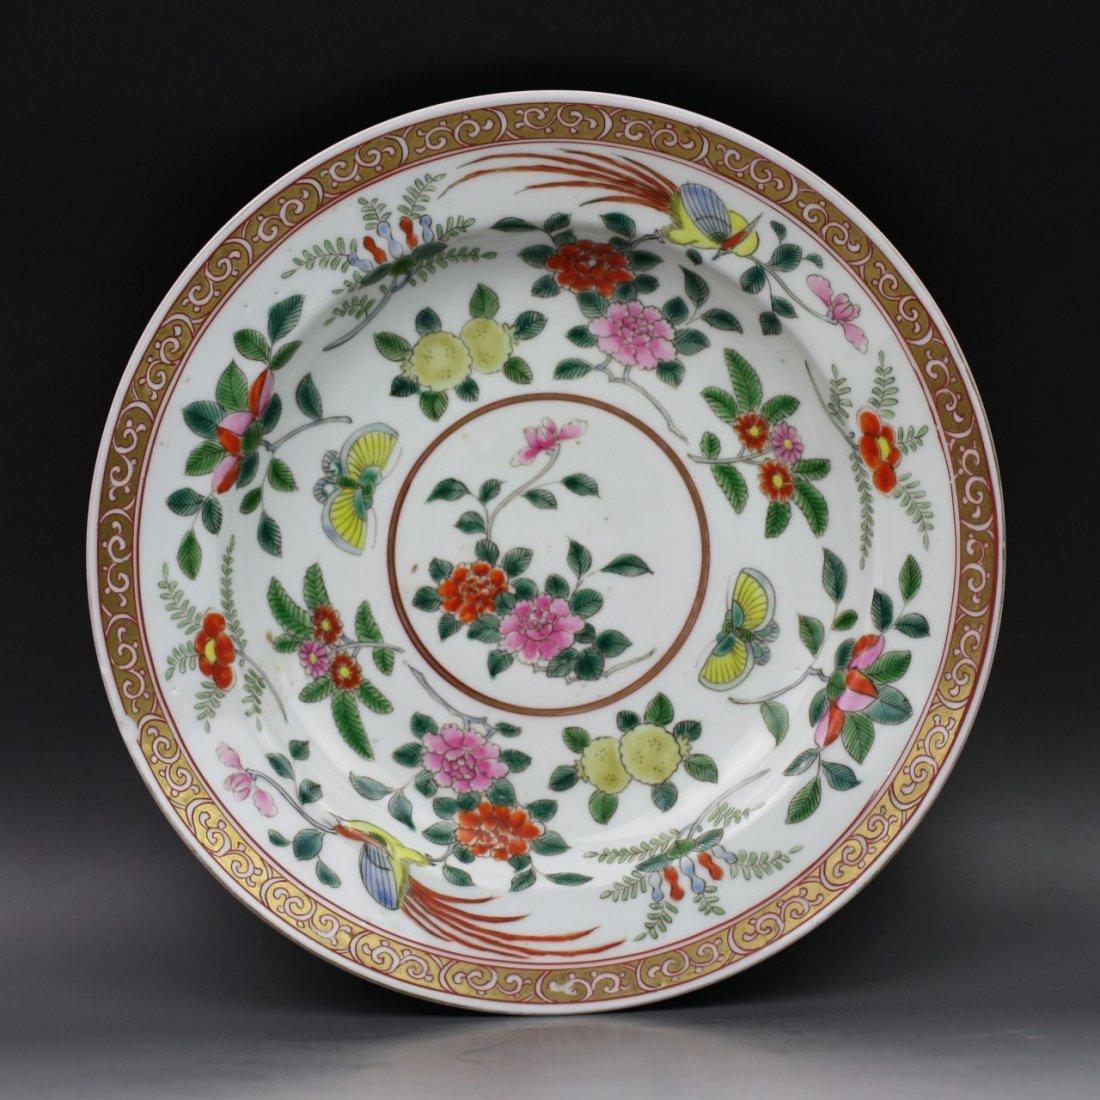 11: A Japanese Arita Polychrome Porcelain Plate